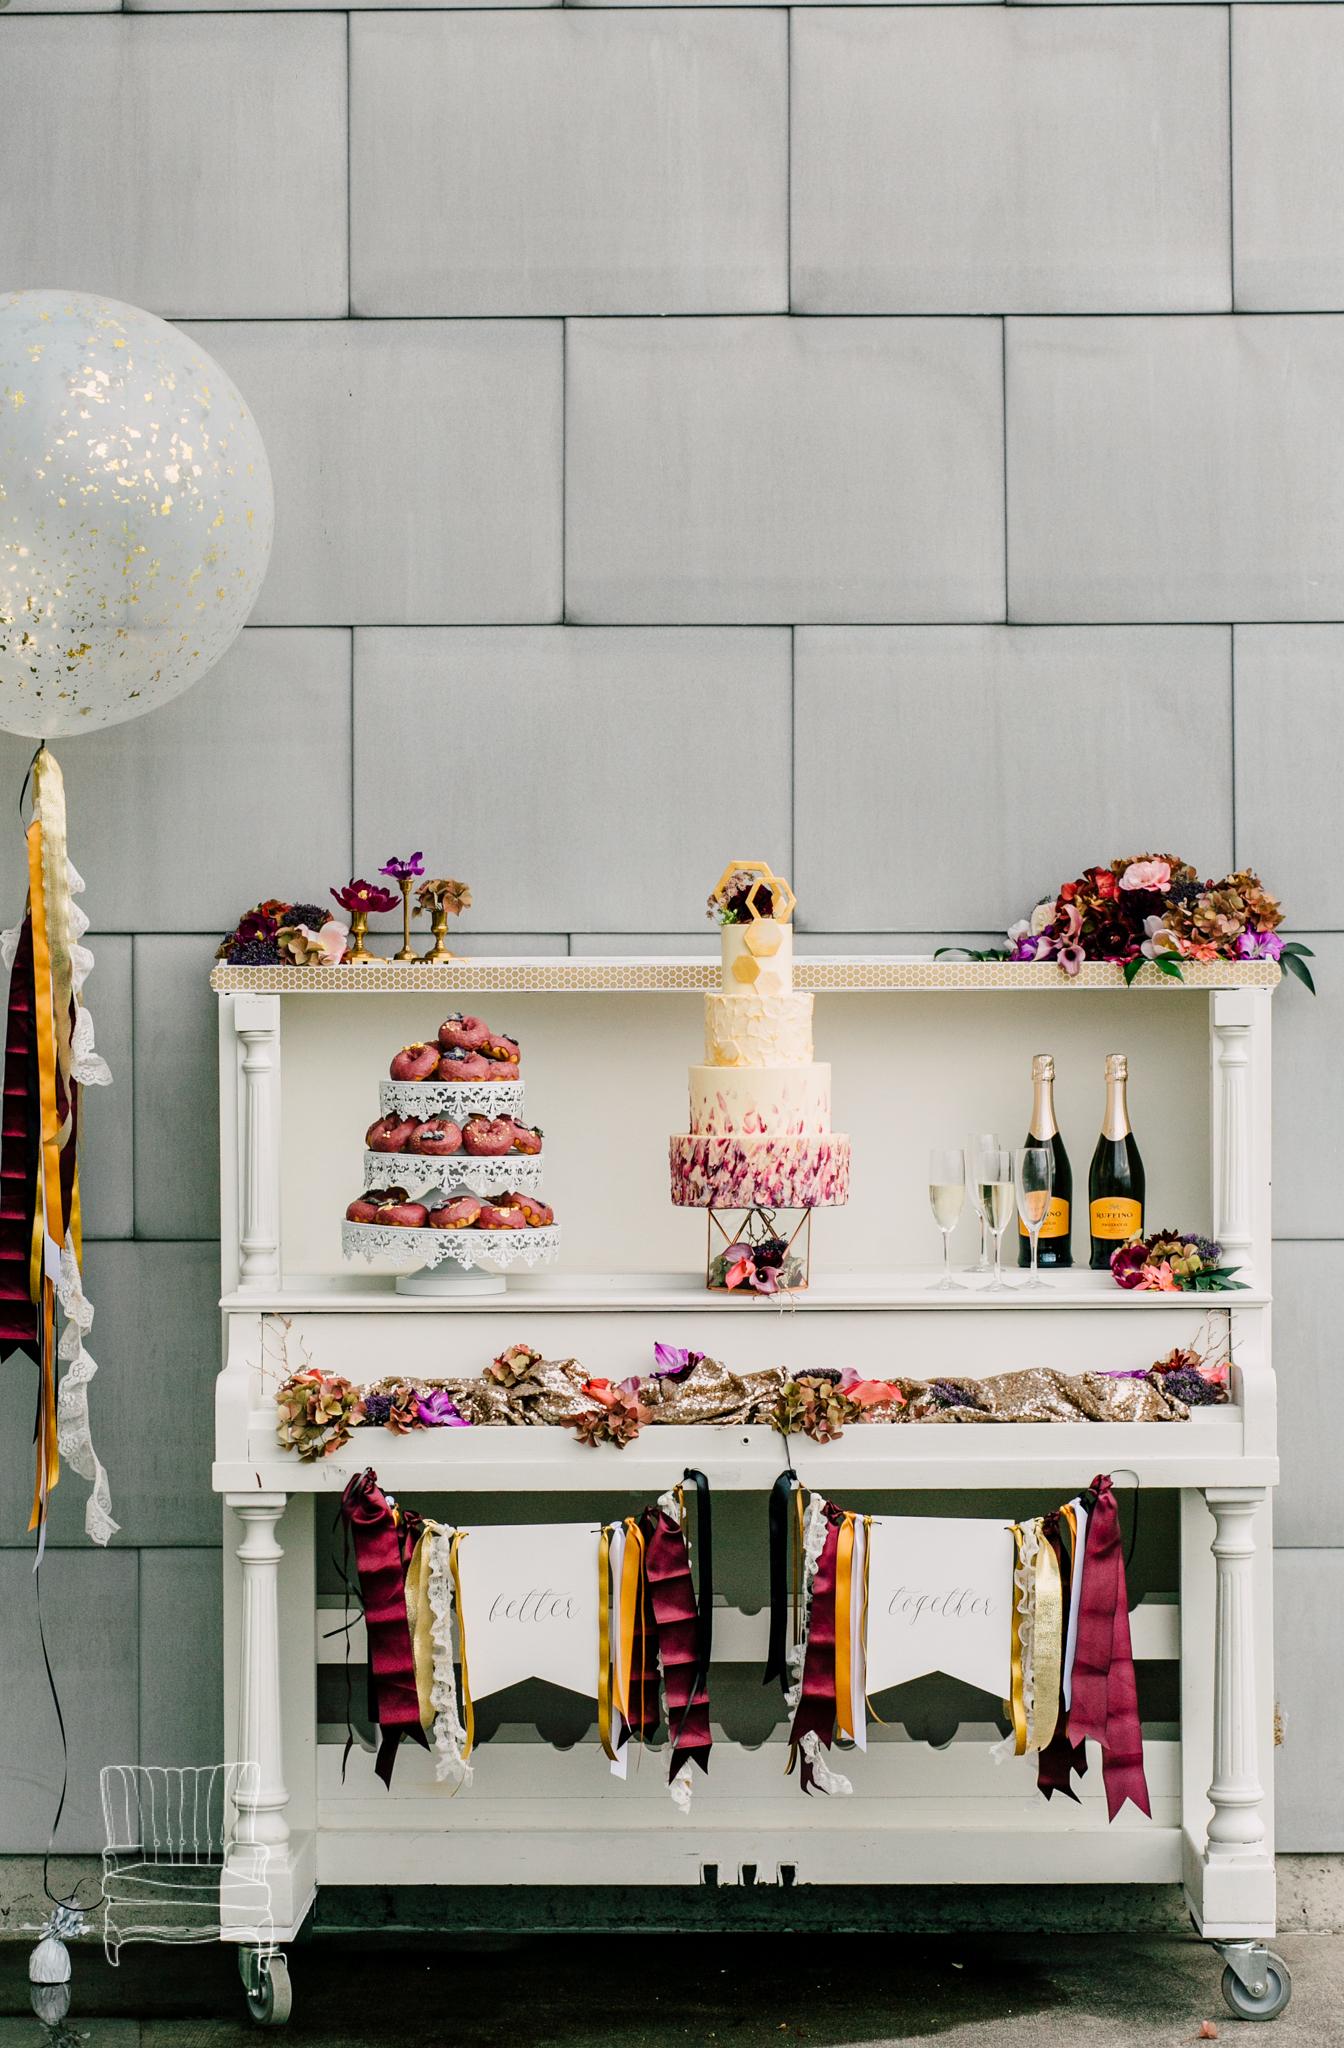 bellwether-bellingham-wedding-styled-katheryn-moran-photography-7.jpg